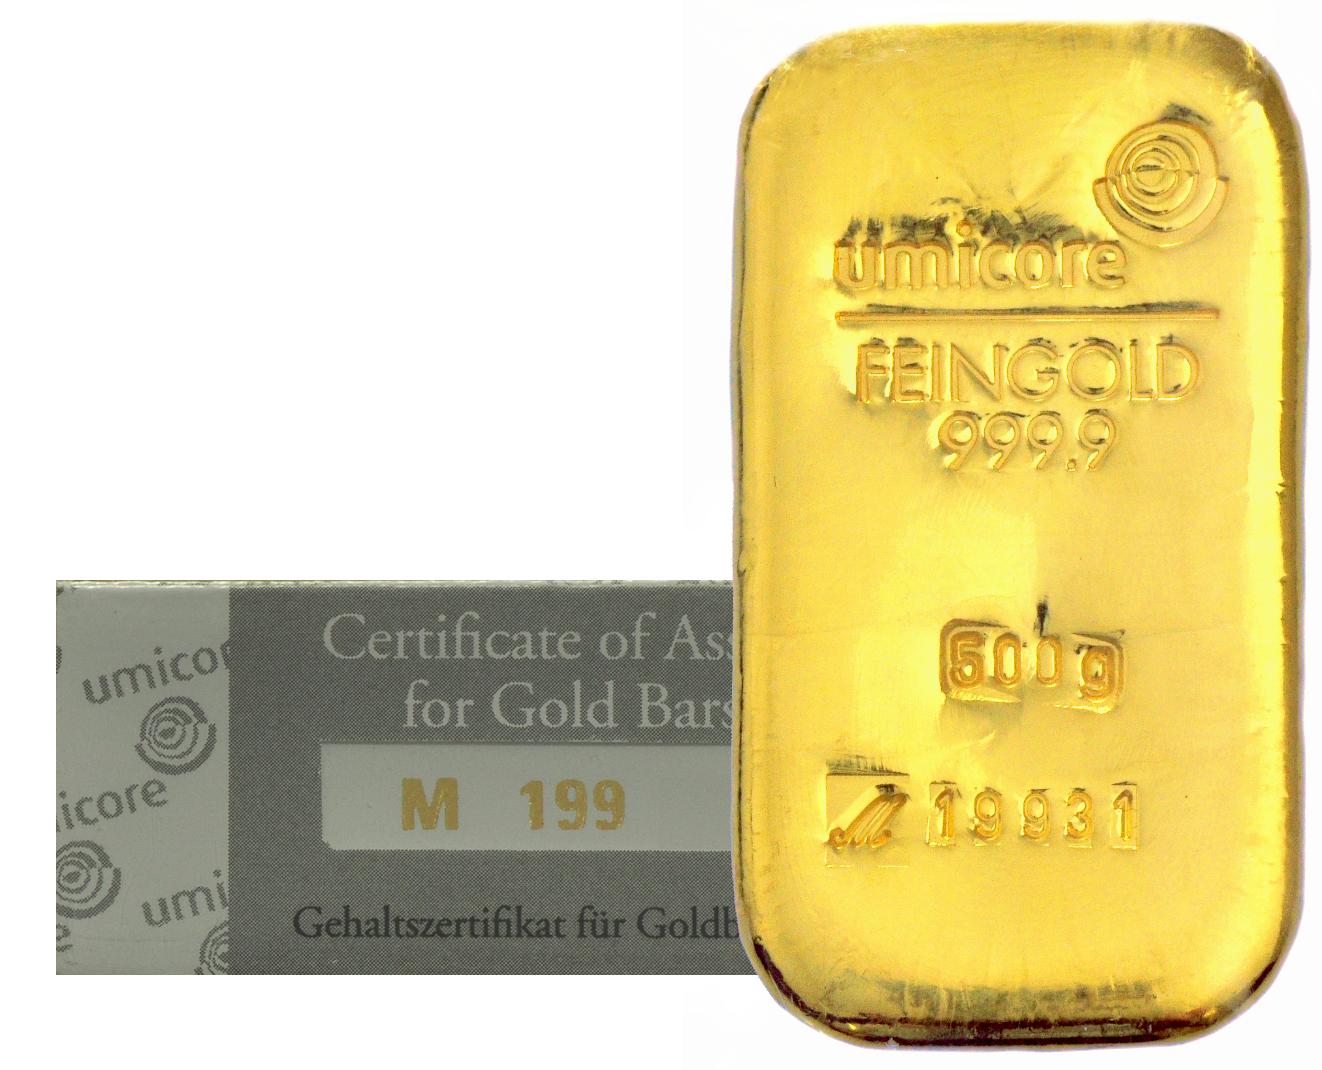 500g Umicore Gold Bars Bullionbypost From 163 13 243